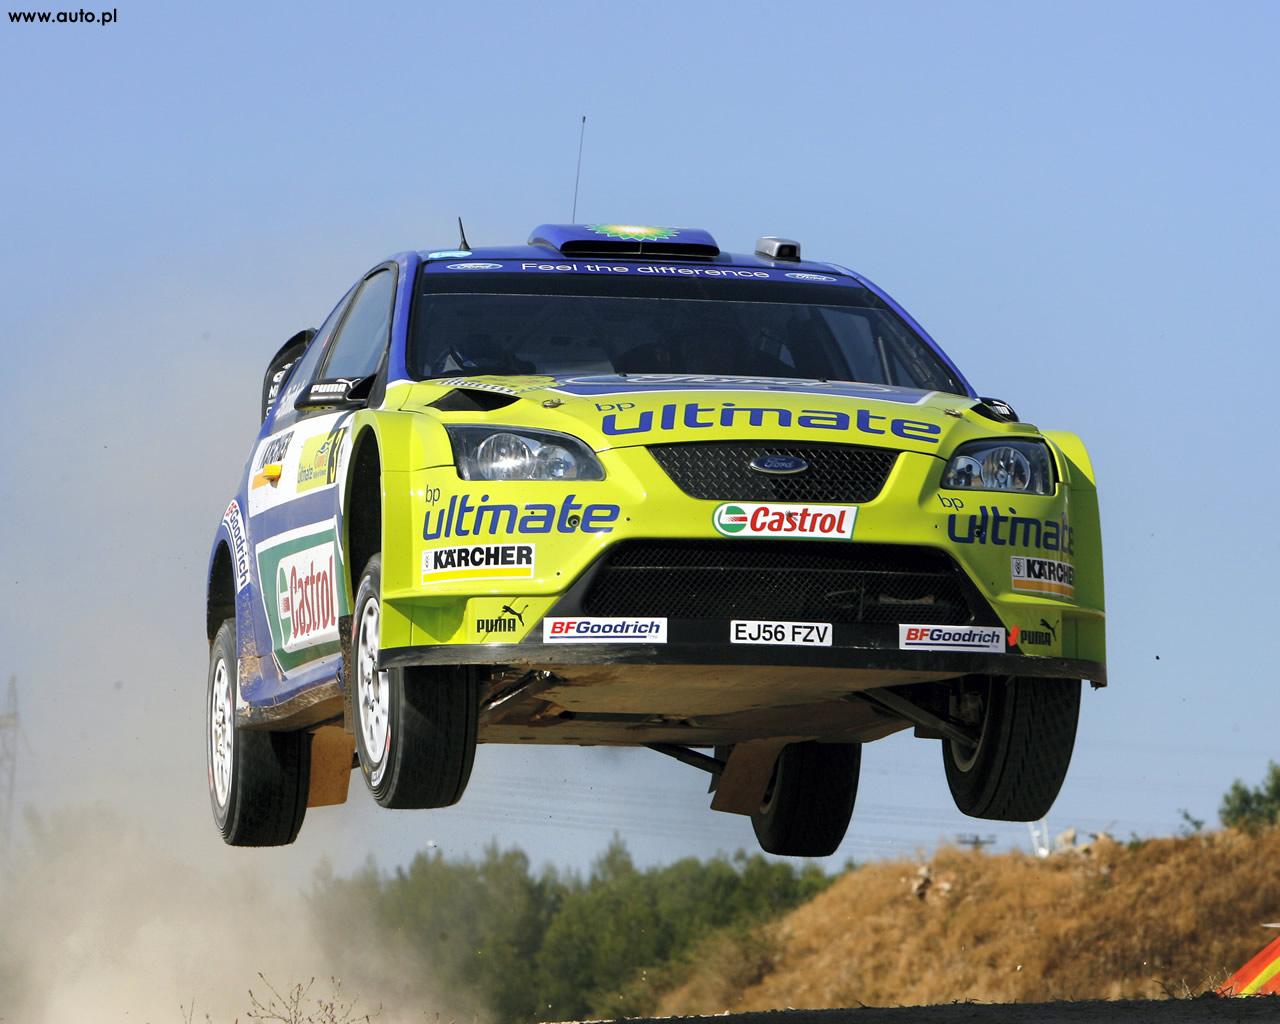 Ford Focus WRC Wallpaper